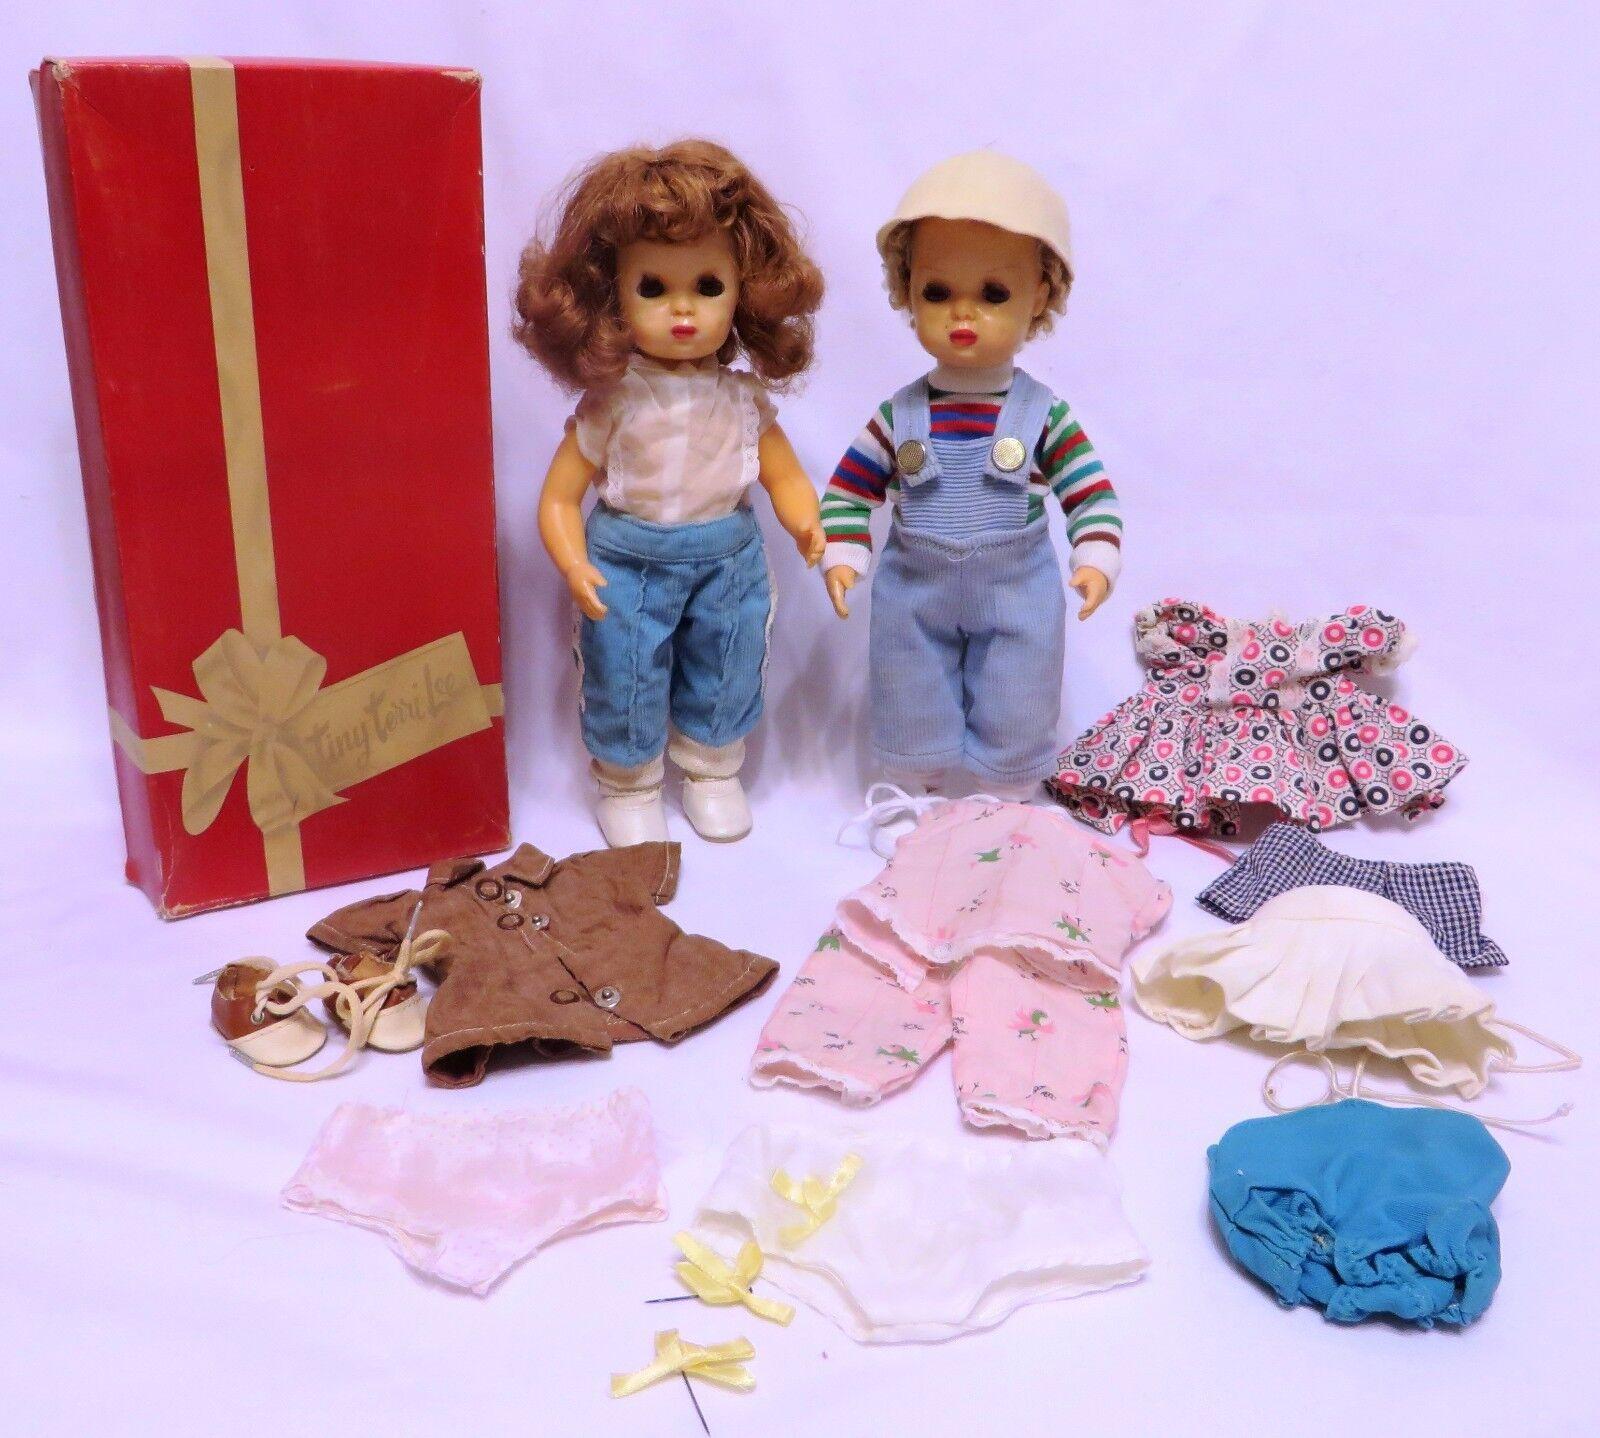 Jahr TINY TERRI LEE & JERRI LEE Masse Dolls, Original Box, Tagged Outfits, More